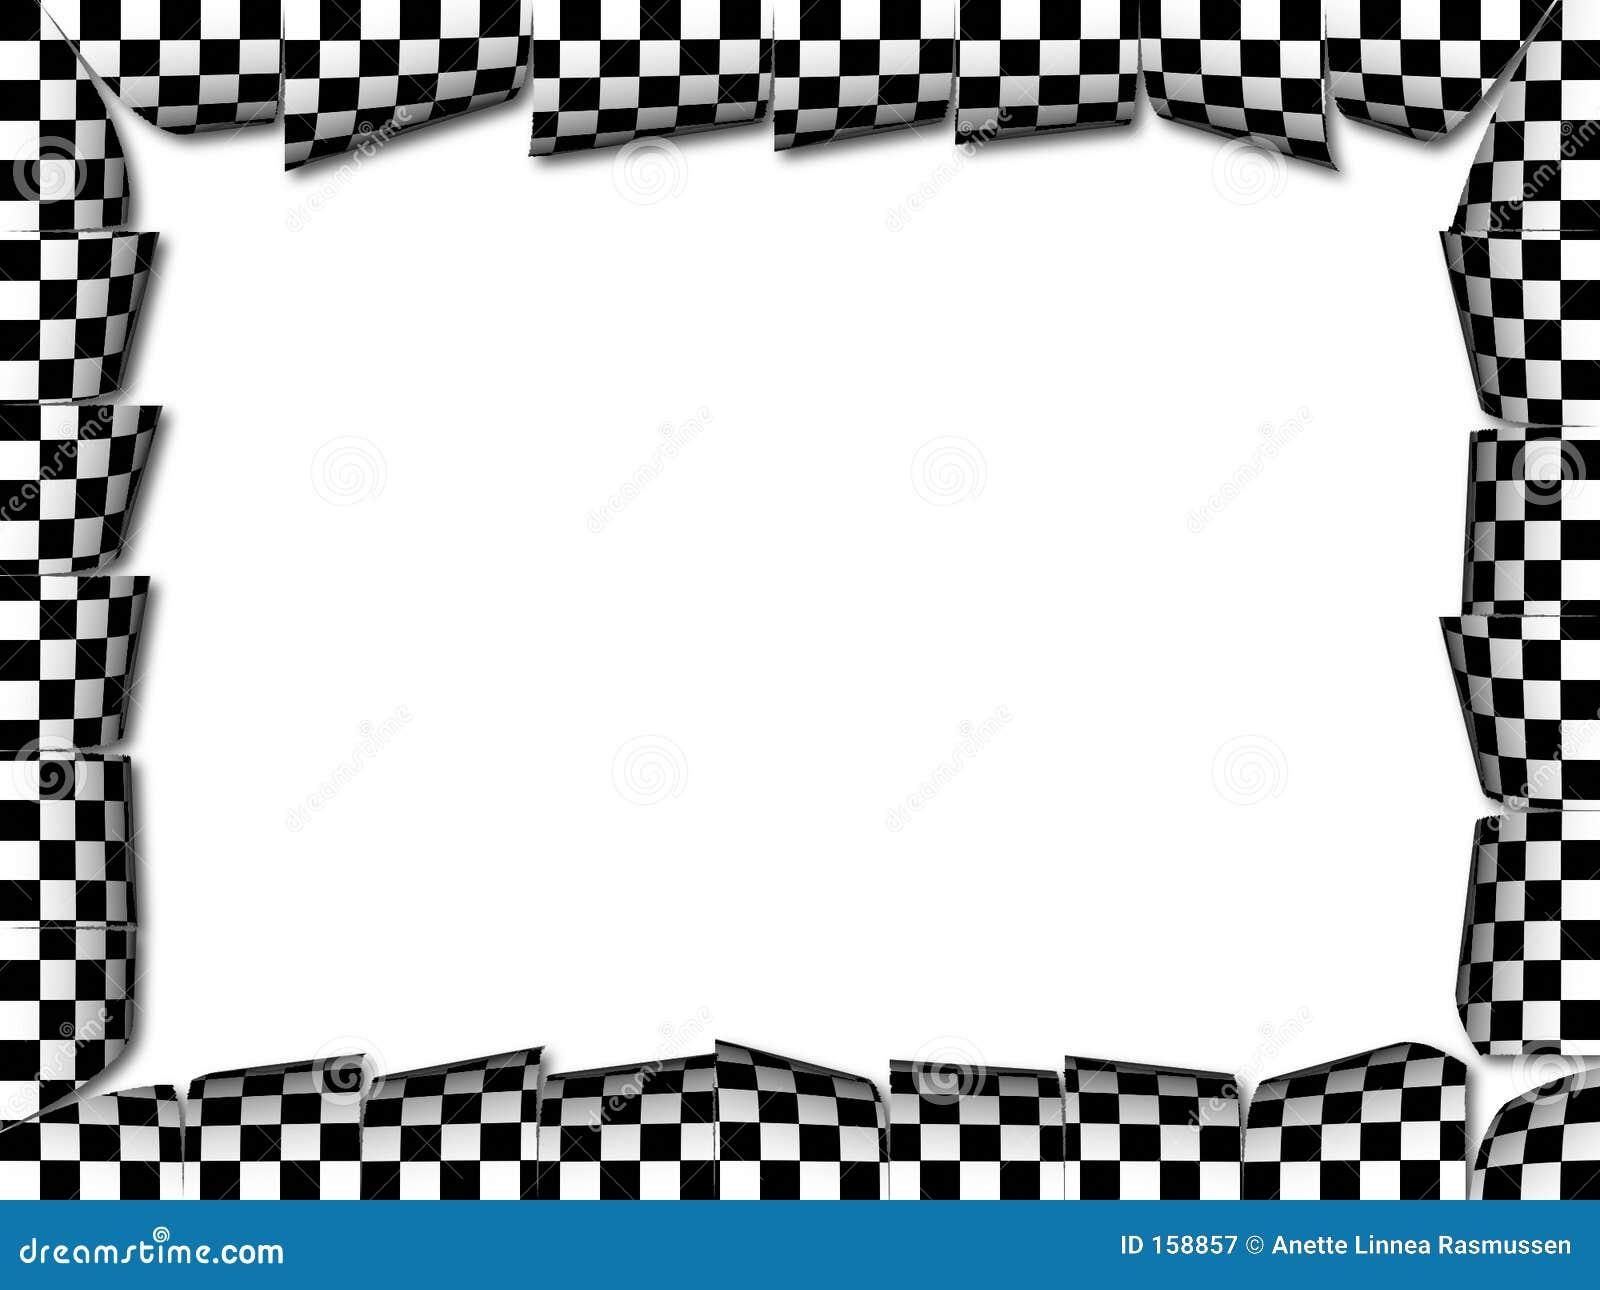 Checkers frame